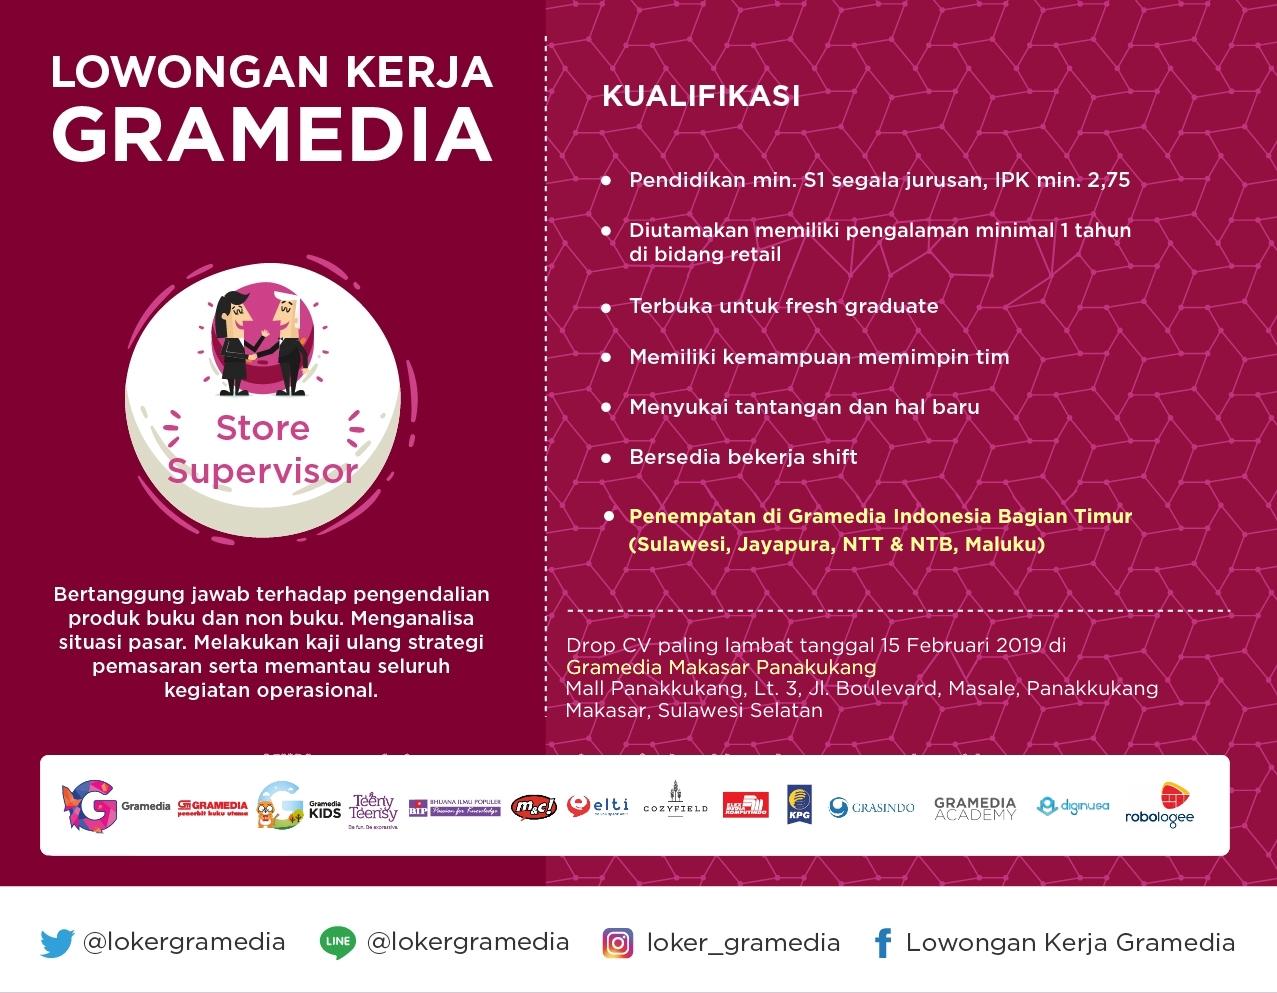 Lowongan Kerja Lowongan Kerja Gramedia Makassar 2019